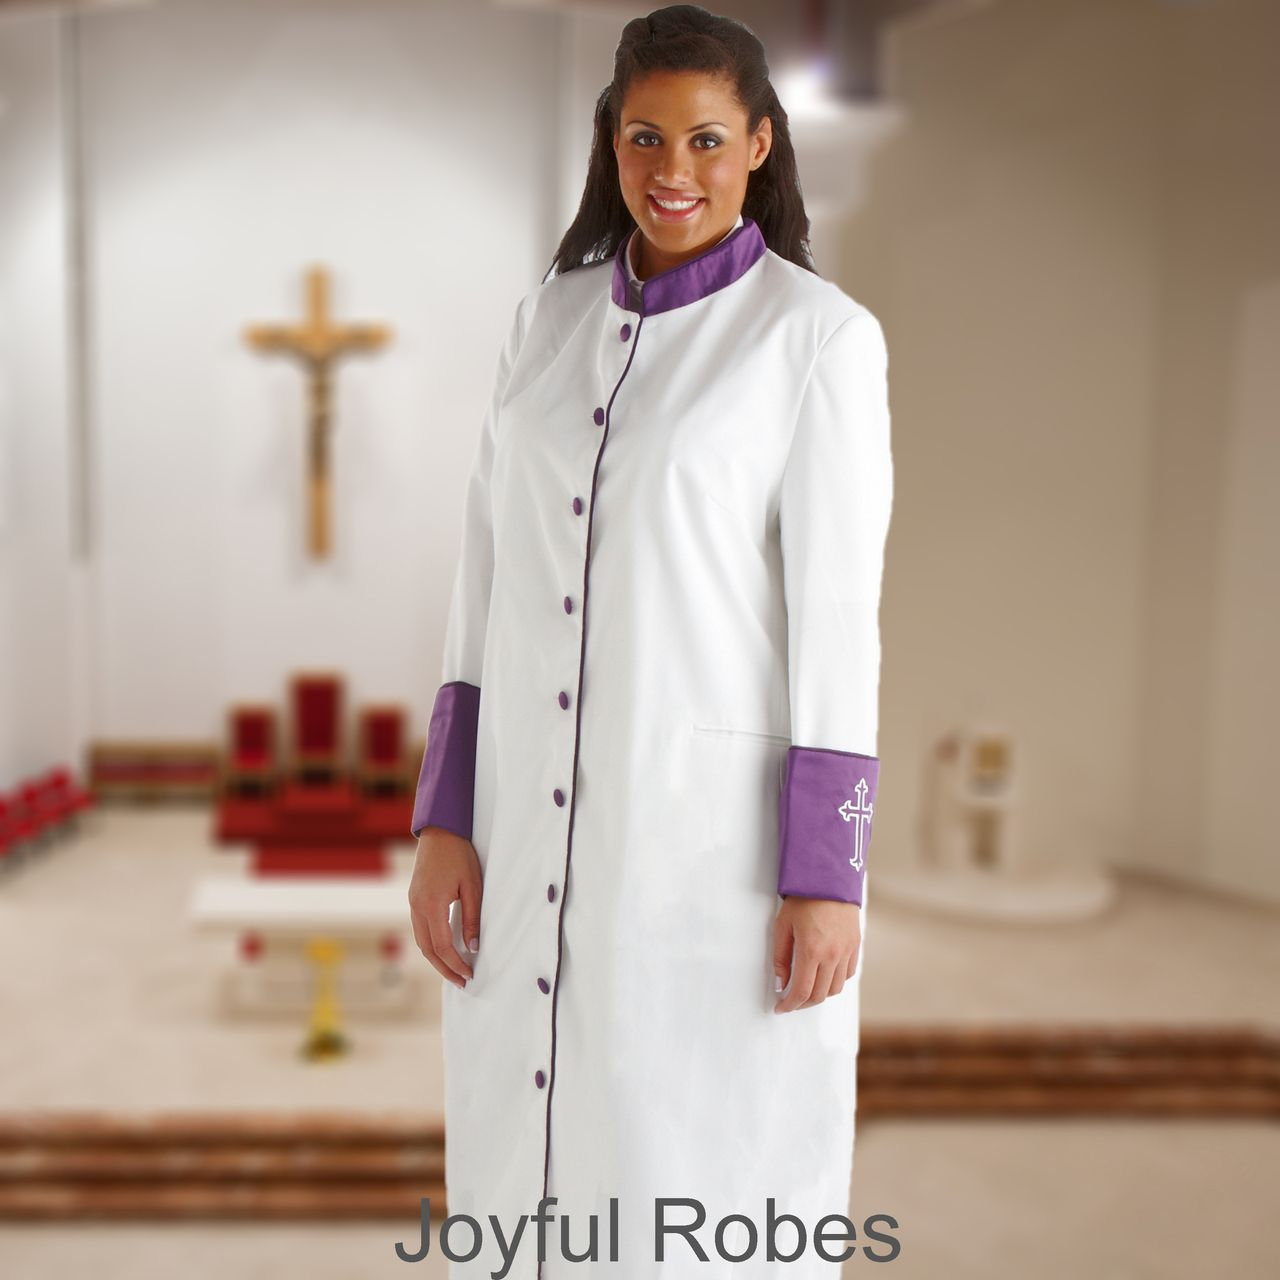 306 W. Women's Clergy/Pastor Robe - White/Purple Cuff